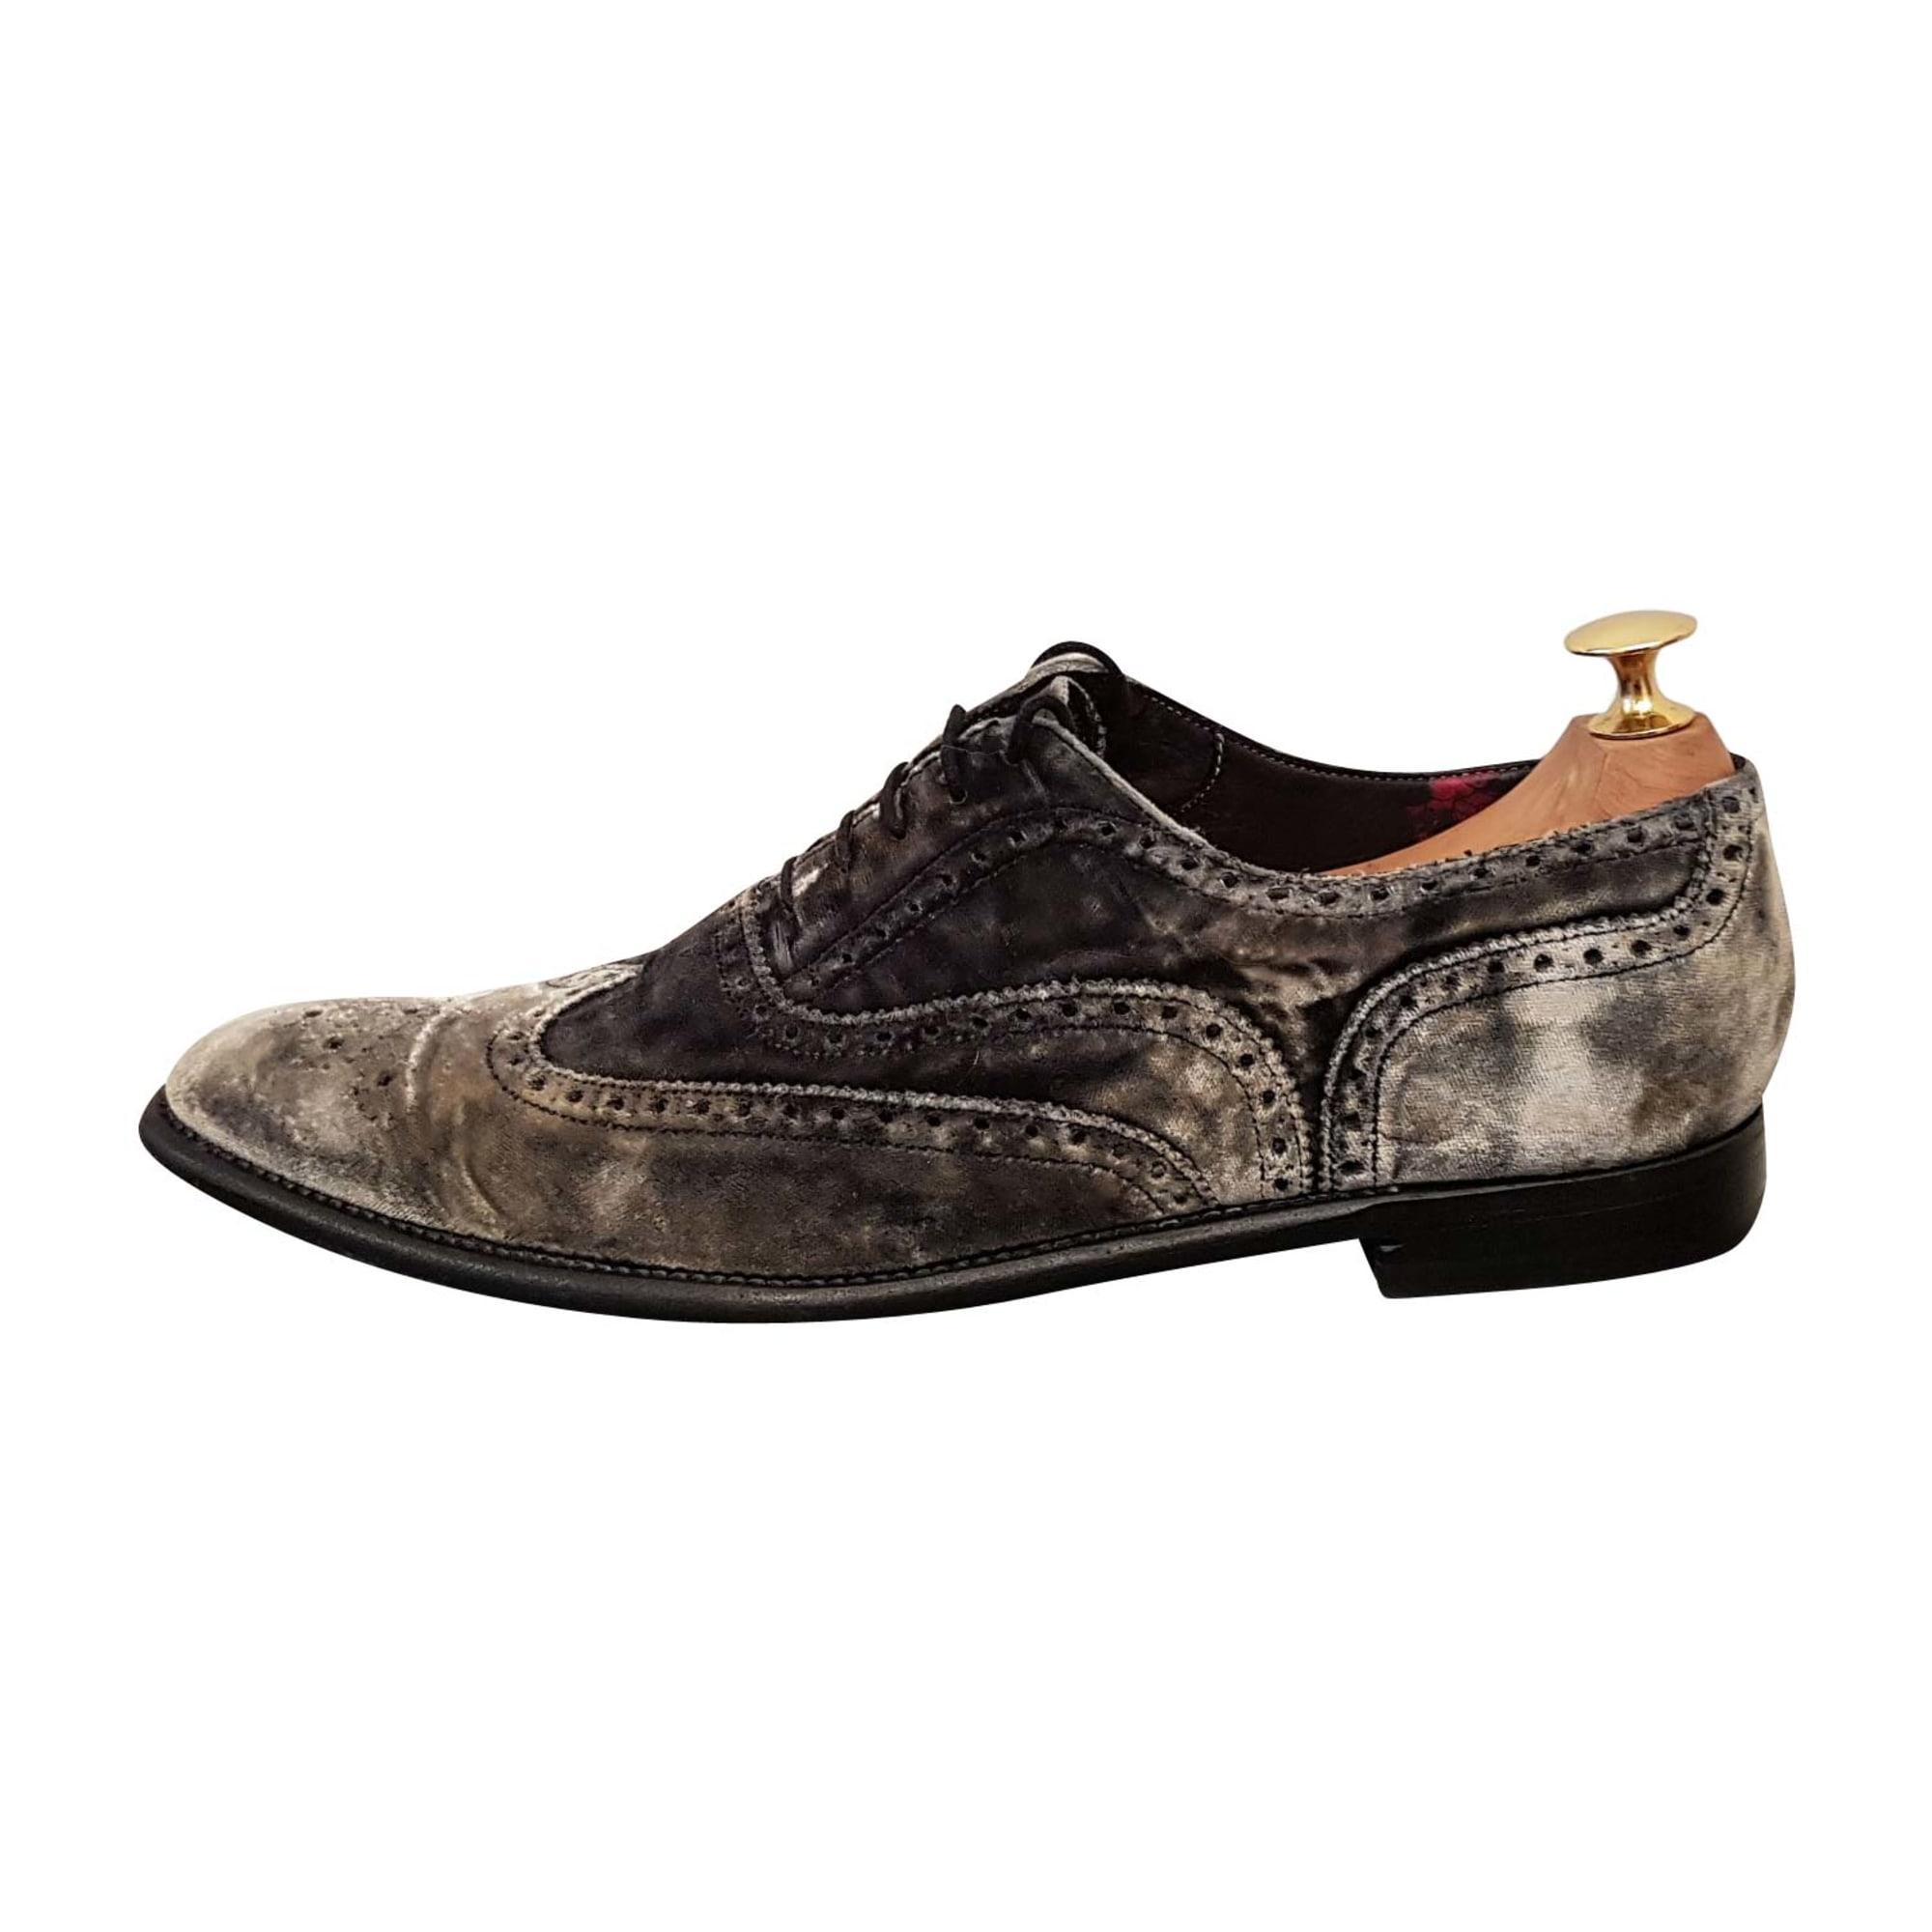 Chaussures à lacets PAUL SMITH Gris, anthracite